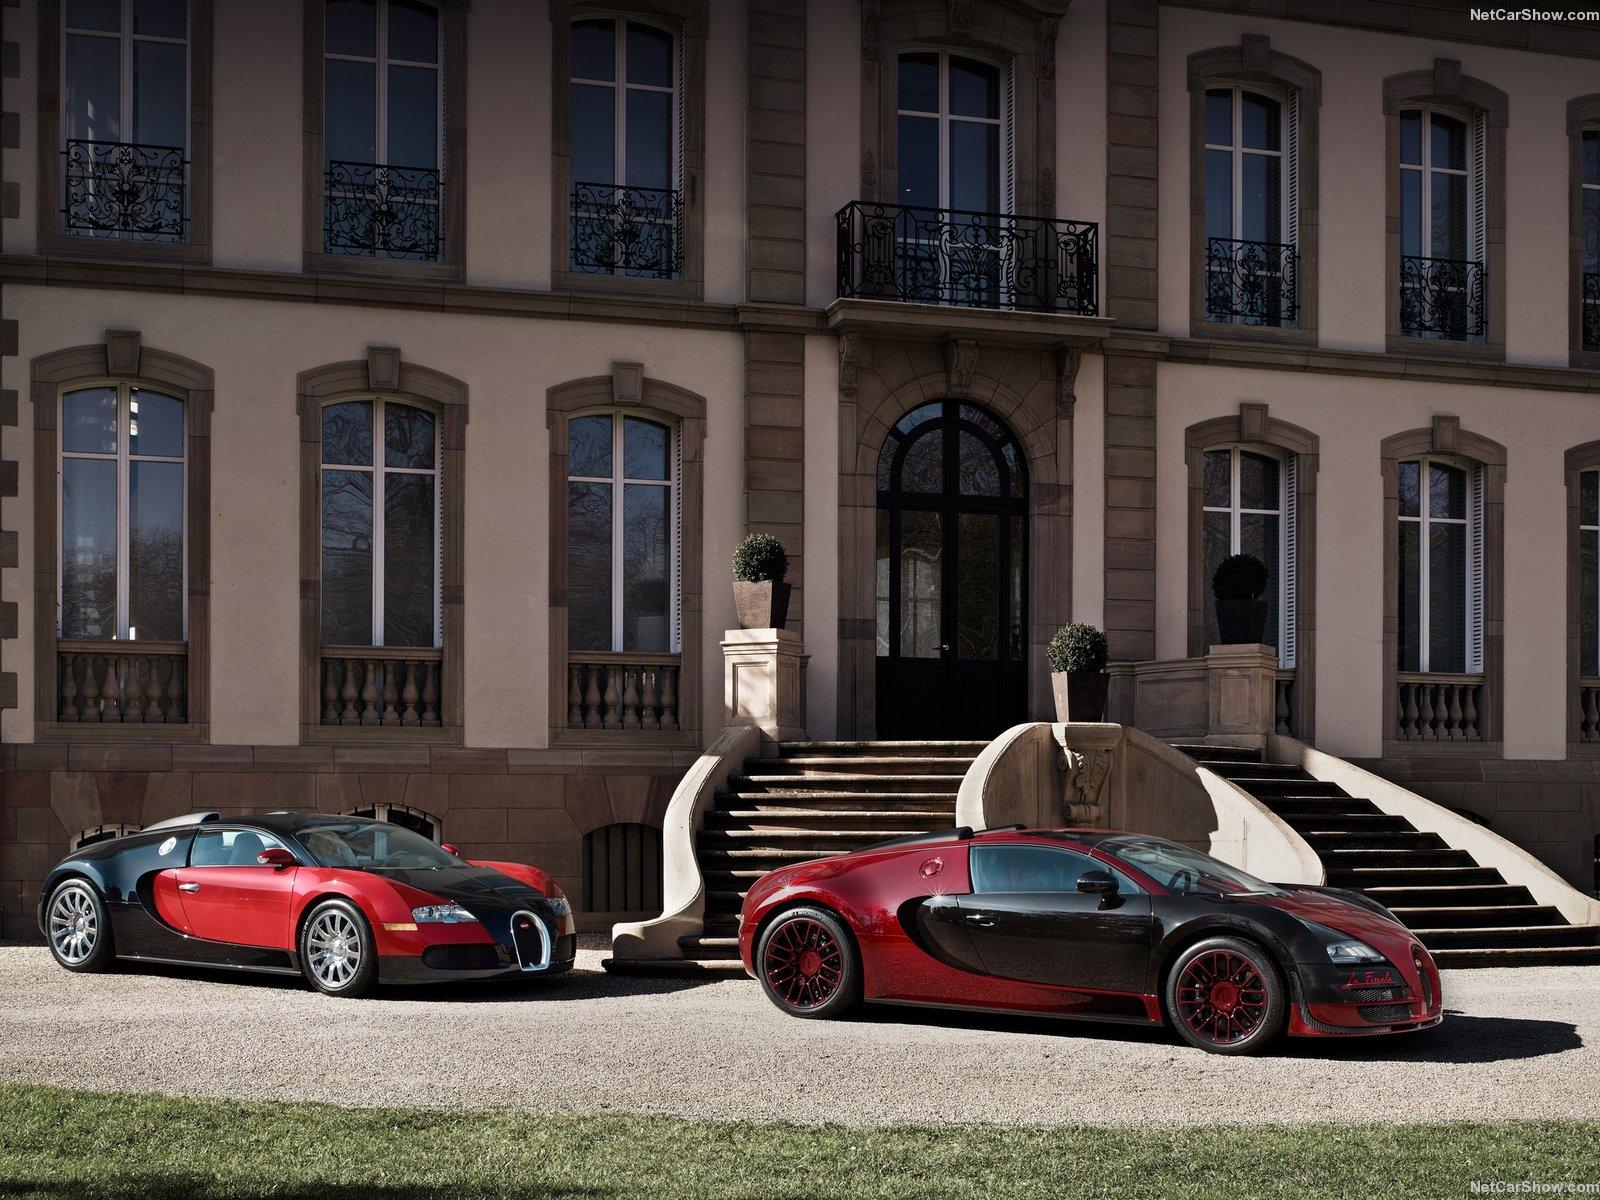 2015%2BBugatti%2BVeyron%2BGrand%2BSport%2BVitesse%2BLa%2BFinale%2B%25283%2529 Astounding Xe Bugatti Veyron Grand Sport Vitesse Cars Trend